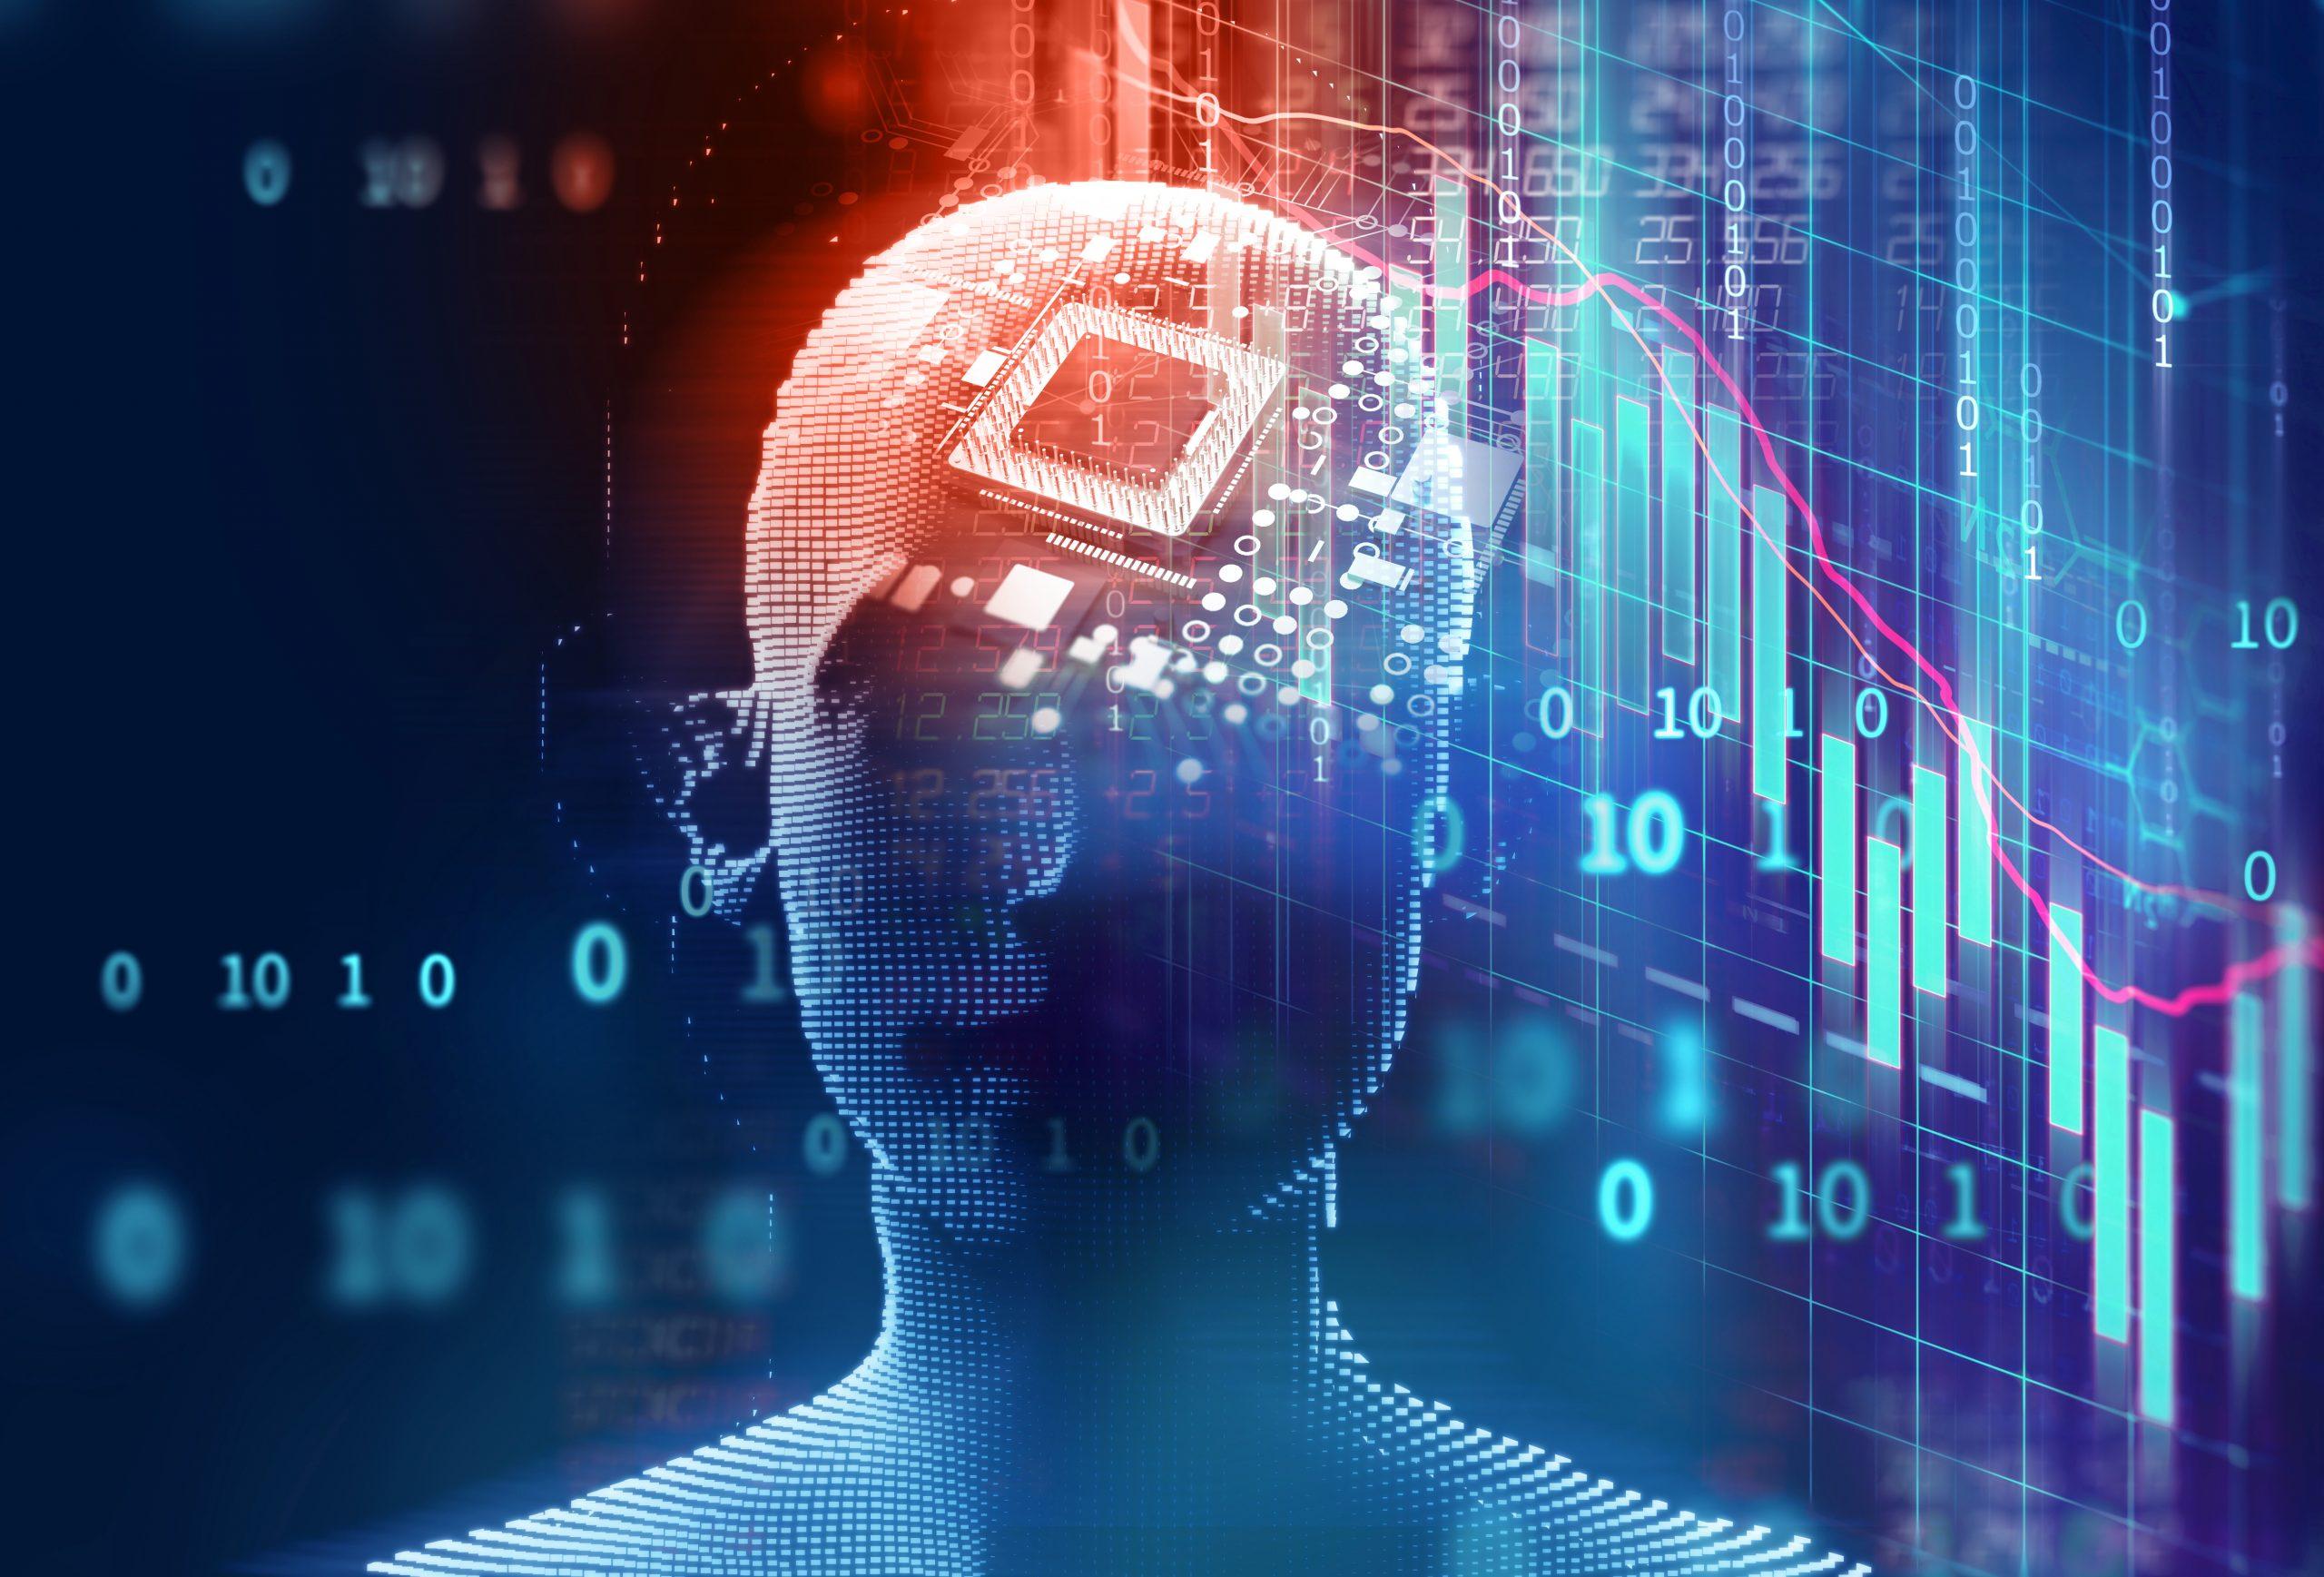 Ai And Machine Learning Gain Momentum With Algo Trading Ats Amid Volatility Flextrade Flextrade